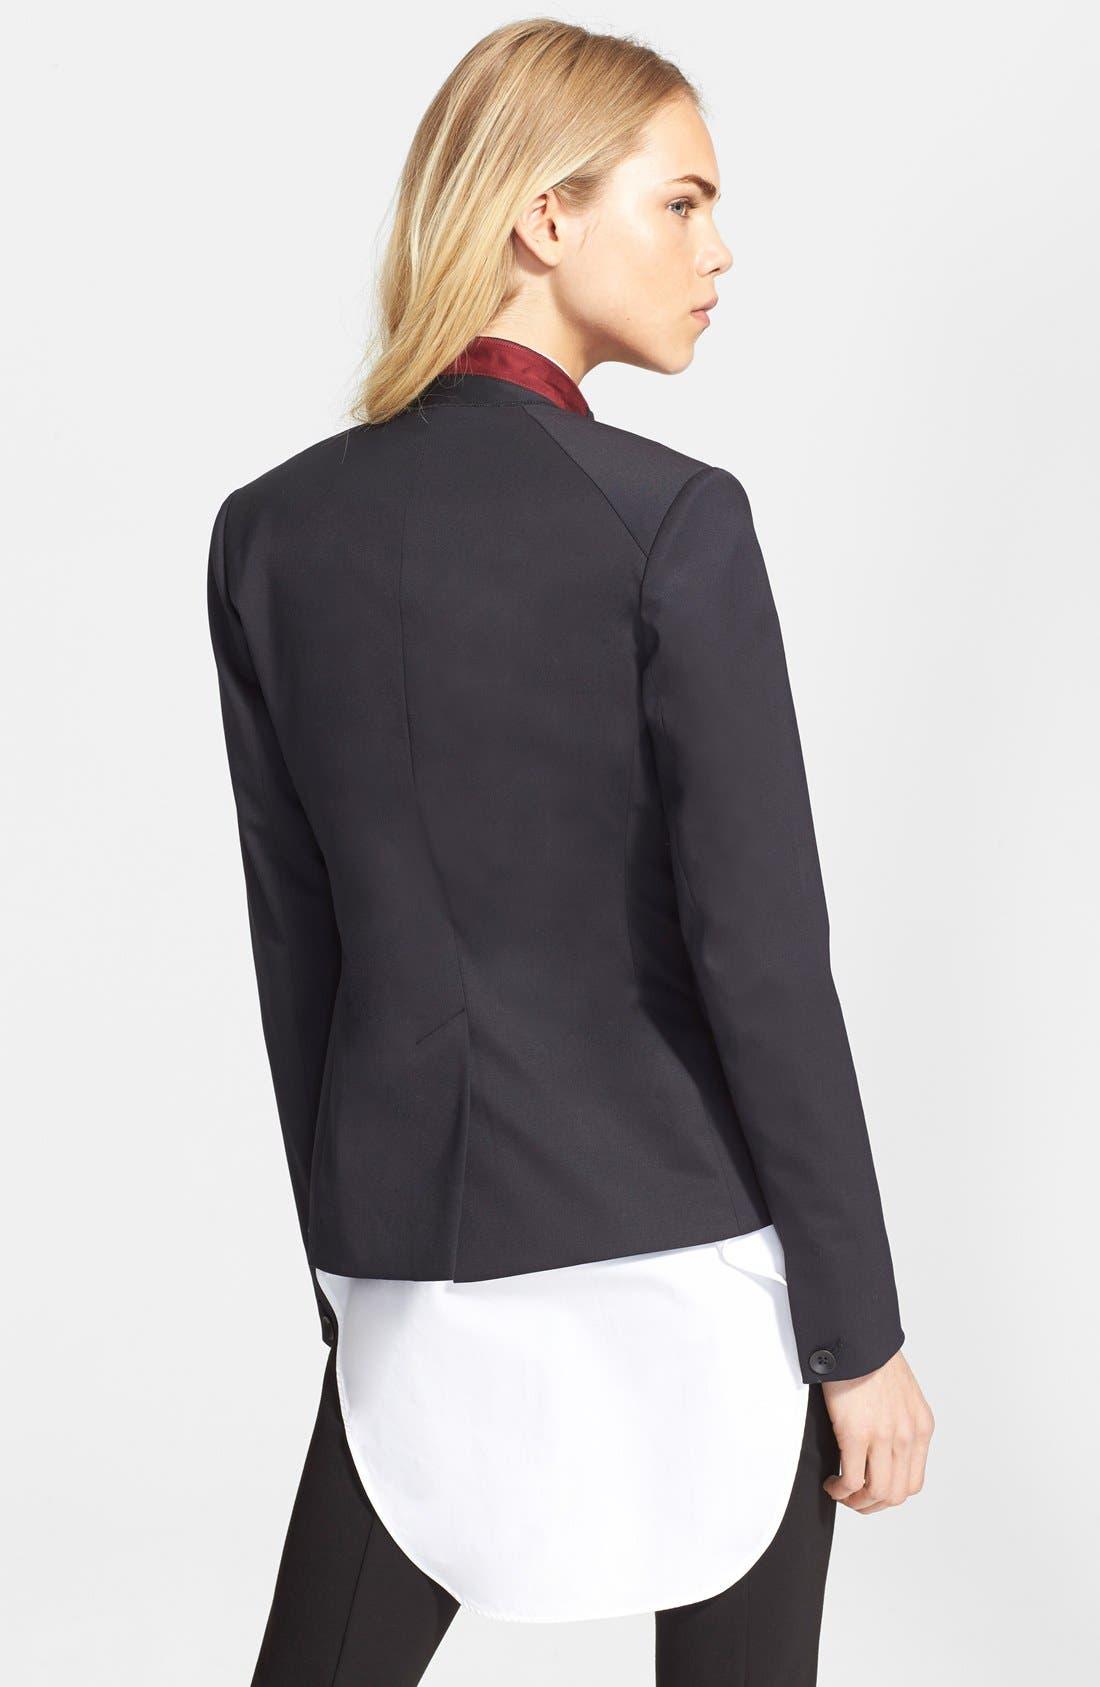 RAG & BONE,                             'Archer' One-Button Wool Blend Blazer,                             Alternate thumbnail 5, color,                             001